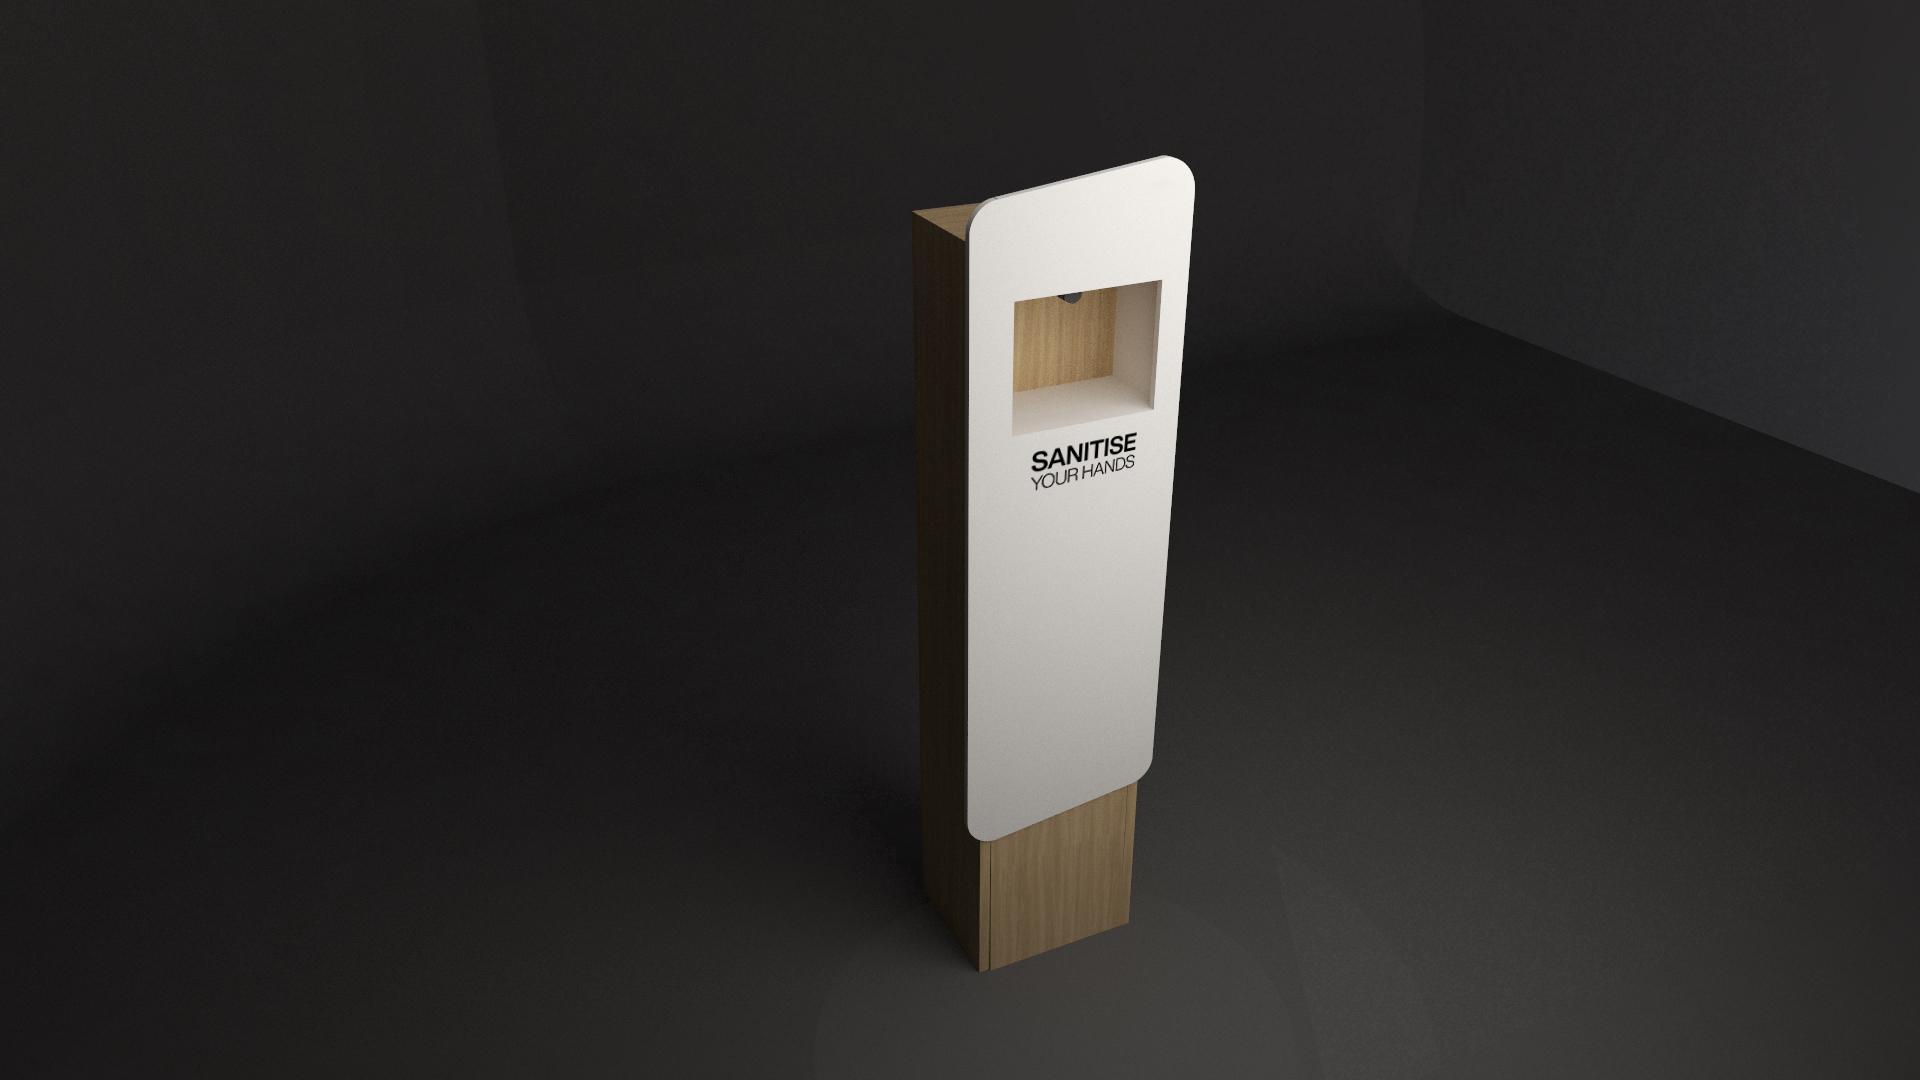 Hanzl Urbane luxury hand sanitiser station for hand hygiene in public situations